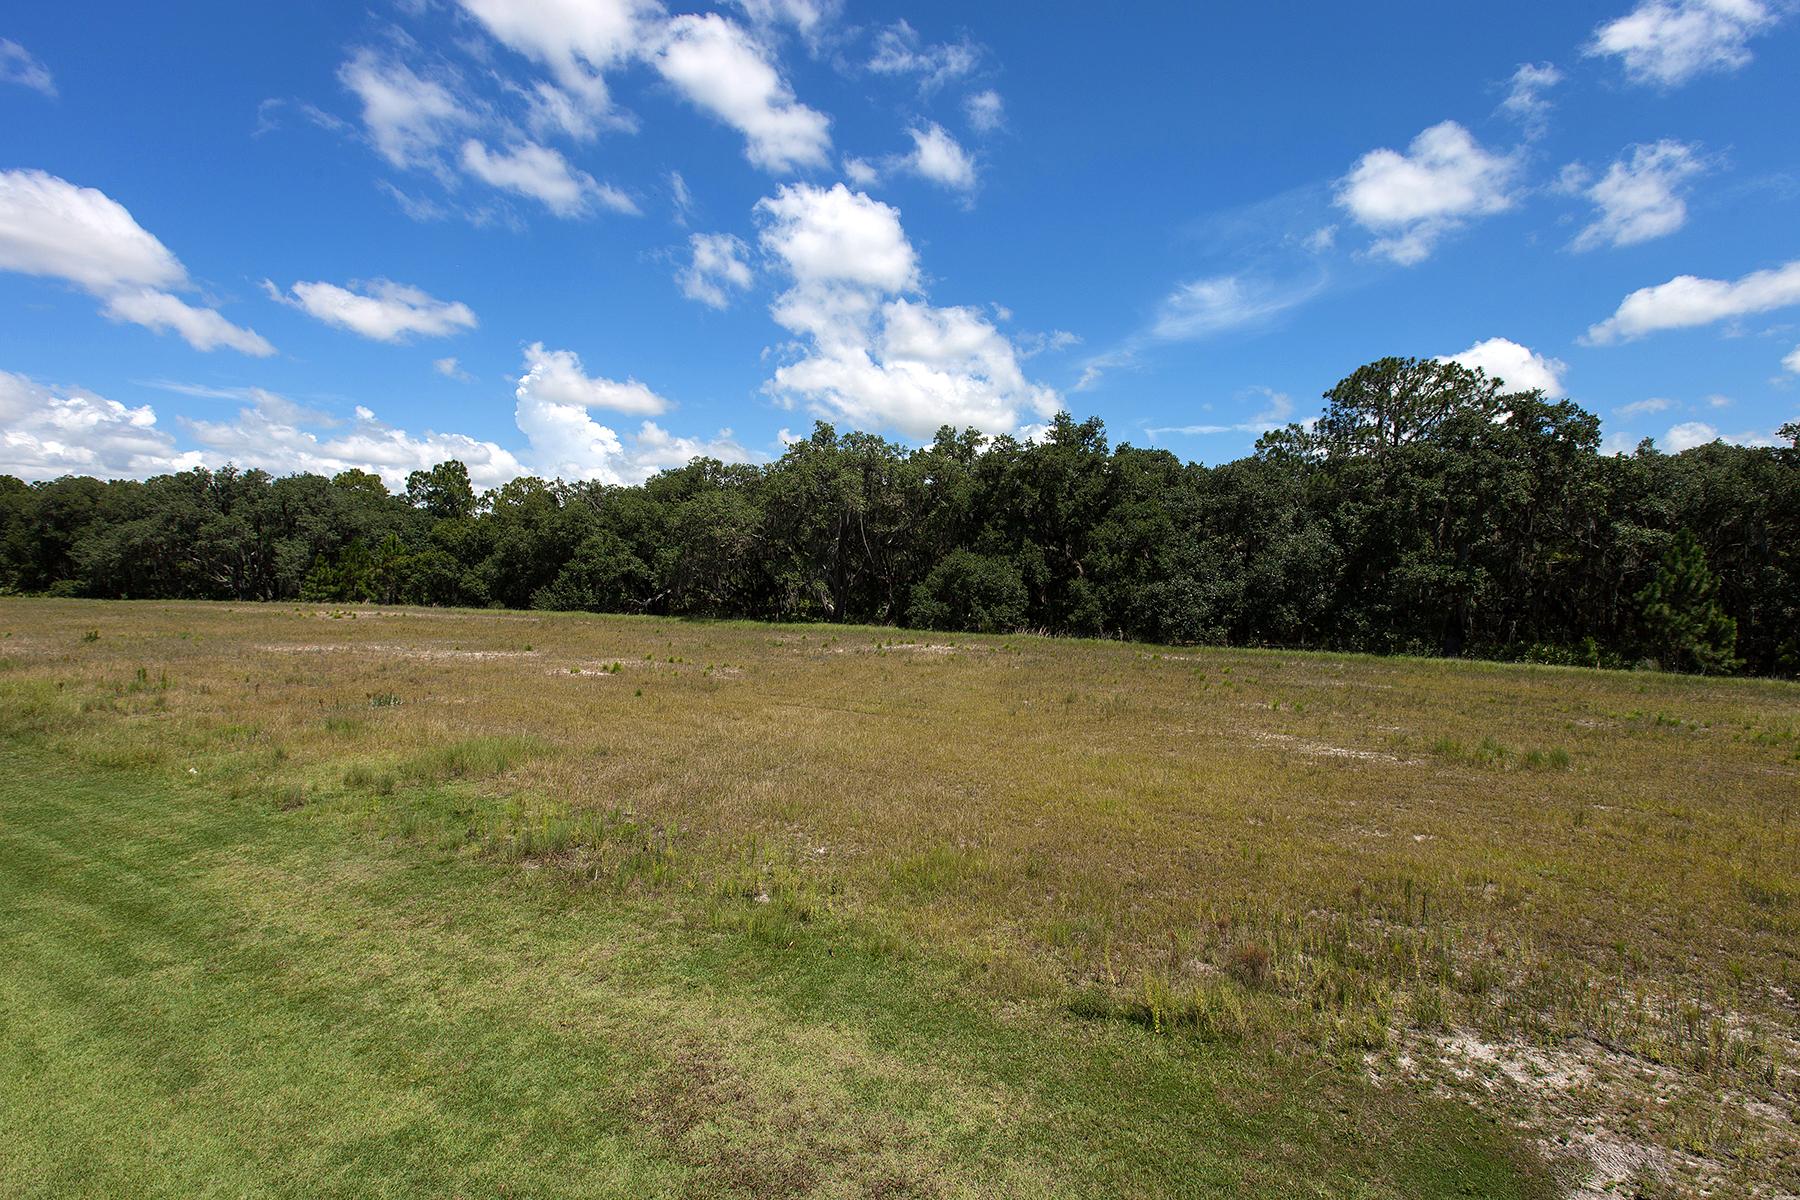 Land for Sale at CONCESSION 19431 Beacon Park Pl 9 Bradenton, Florida 34202 United States